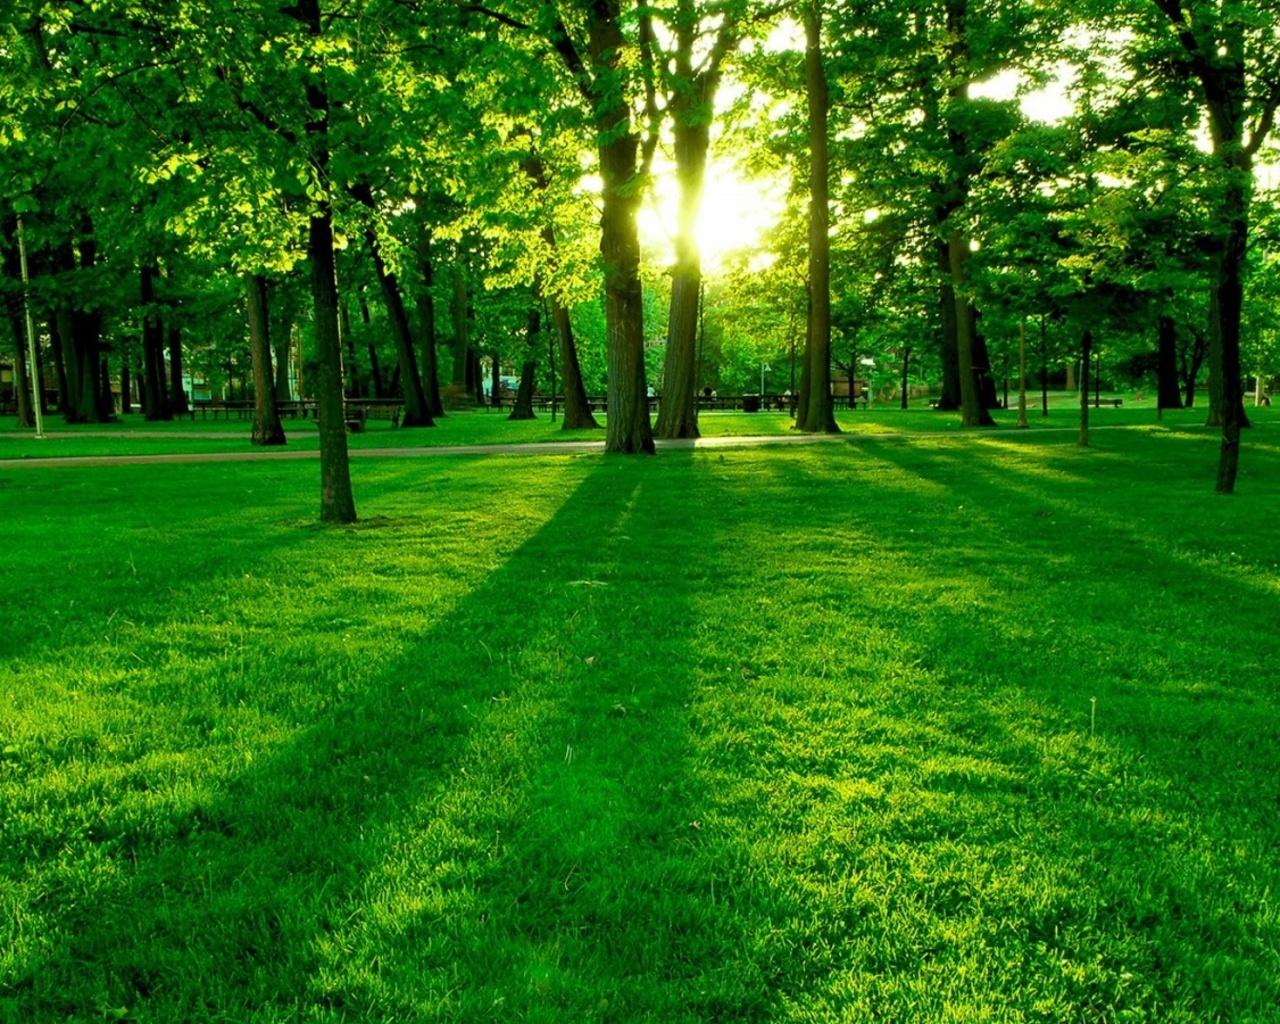 http://4.bp.blogspot.com/-YnntNKij_YI/T77IP0KE7PI/AAAAAAAAE18/caFRXk90sOk/s1600/Green-Forest-Wallpaper-green-20036604-1280-1024.jpg